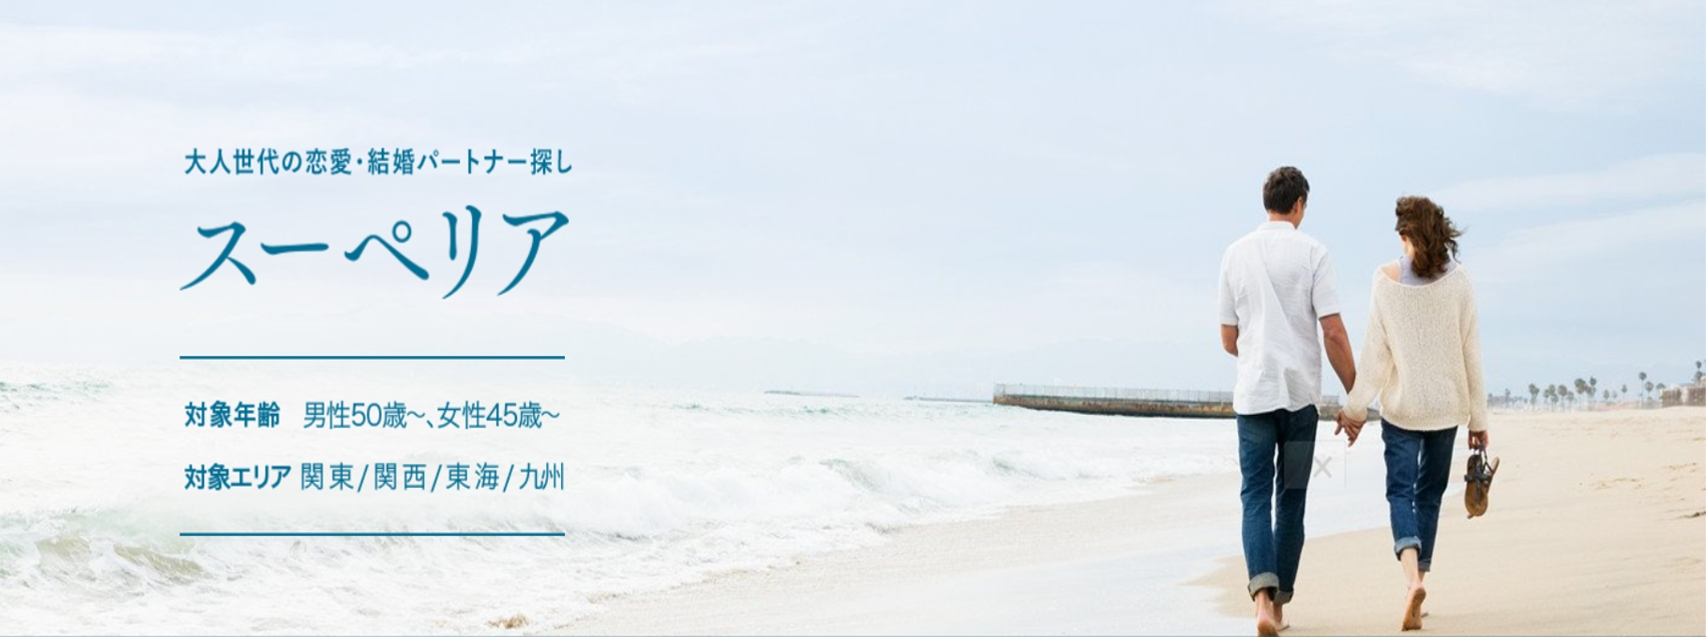 dac9897edc172 楽天オーネット・スーペリア 中高年未会員向けイベント開催告知|楽天オーネットのプレスリリース